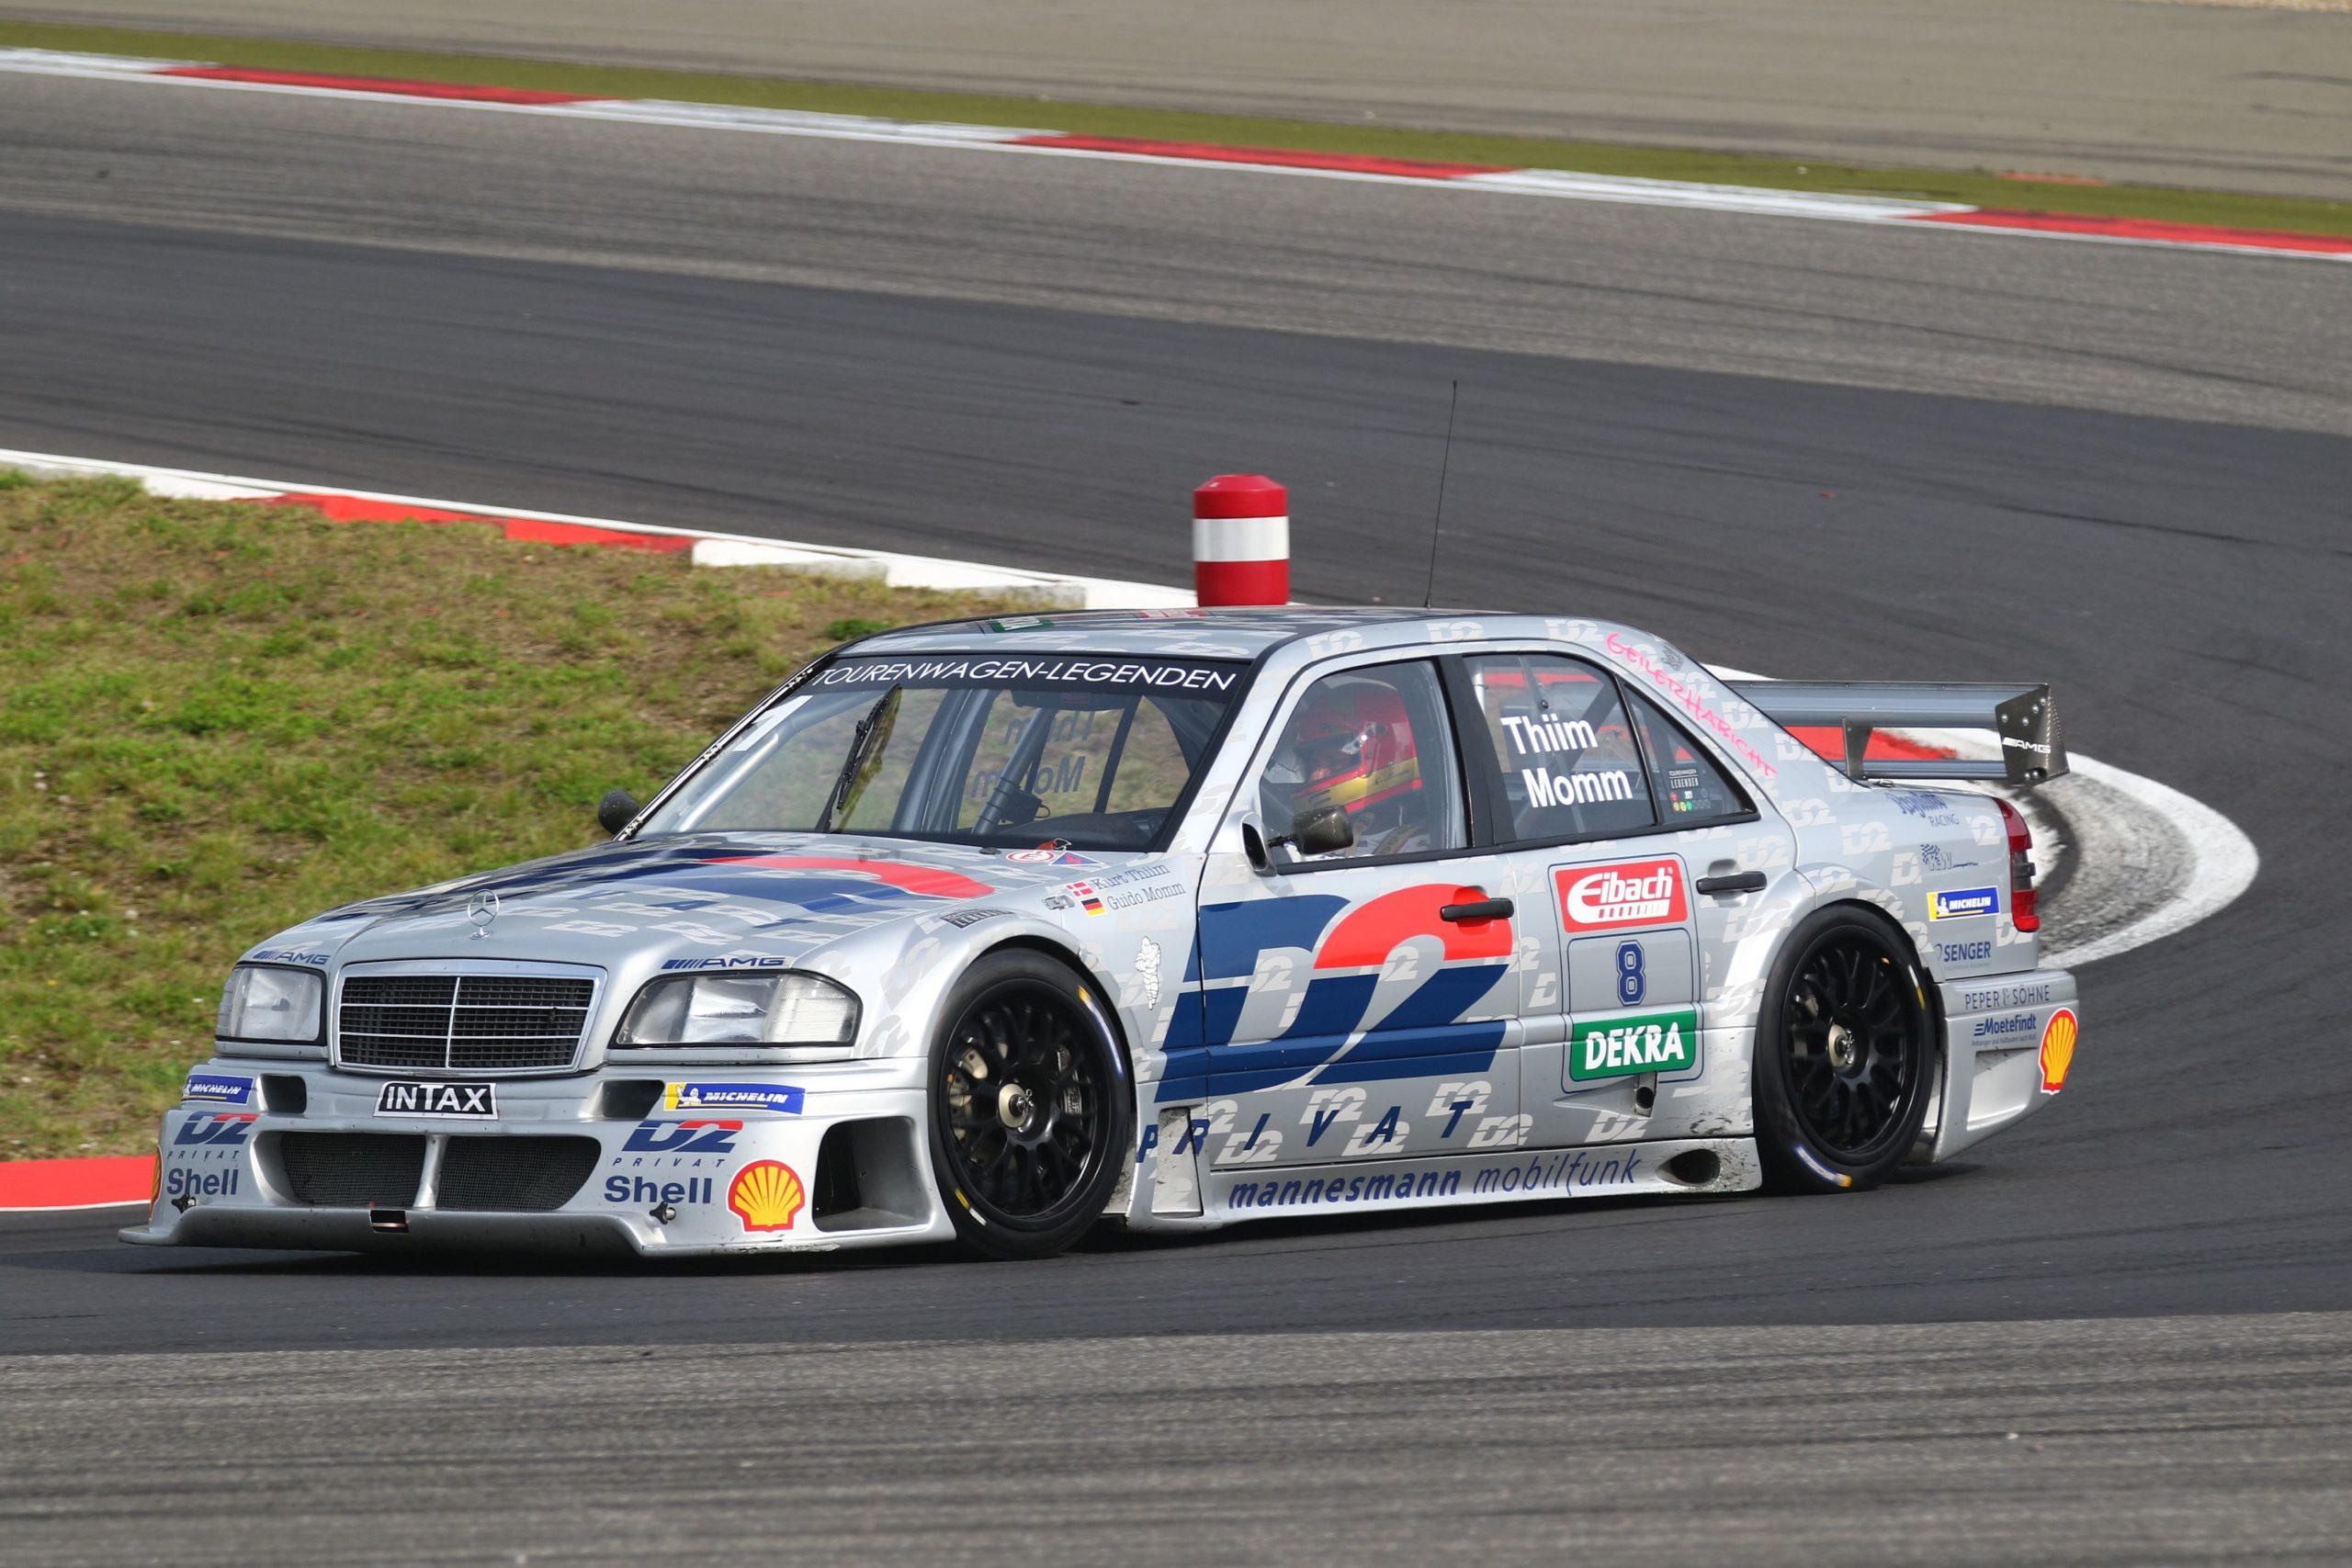 2021-DTM-Classic-Nuerburgring-tst-sport-und-technik-Mercedes-Benz-C-Klasse-Guido-Momm-2116875